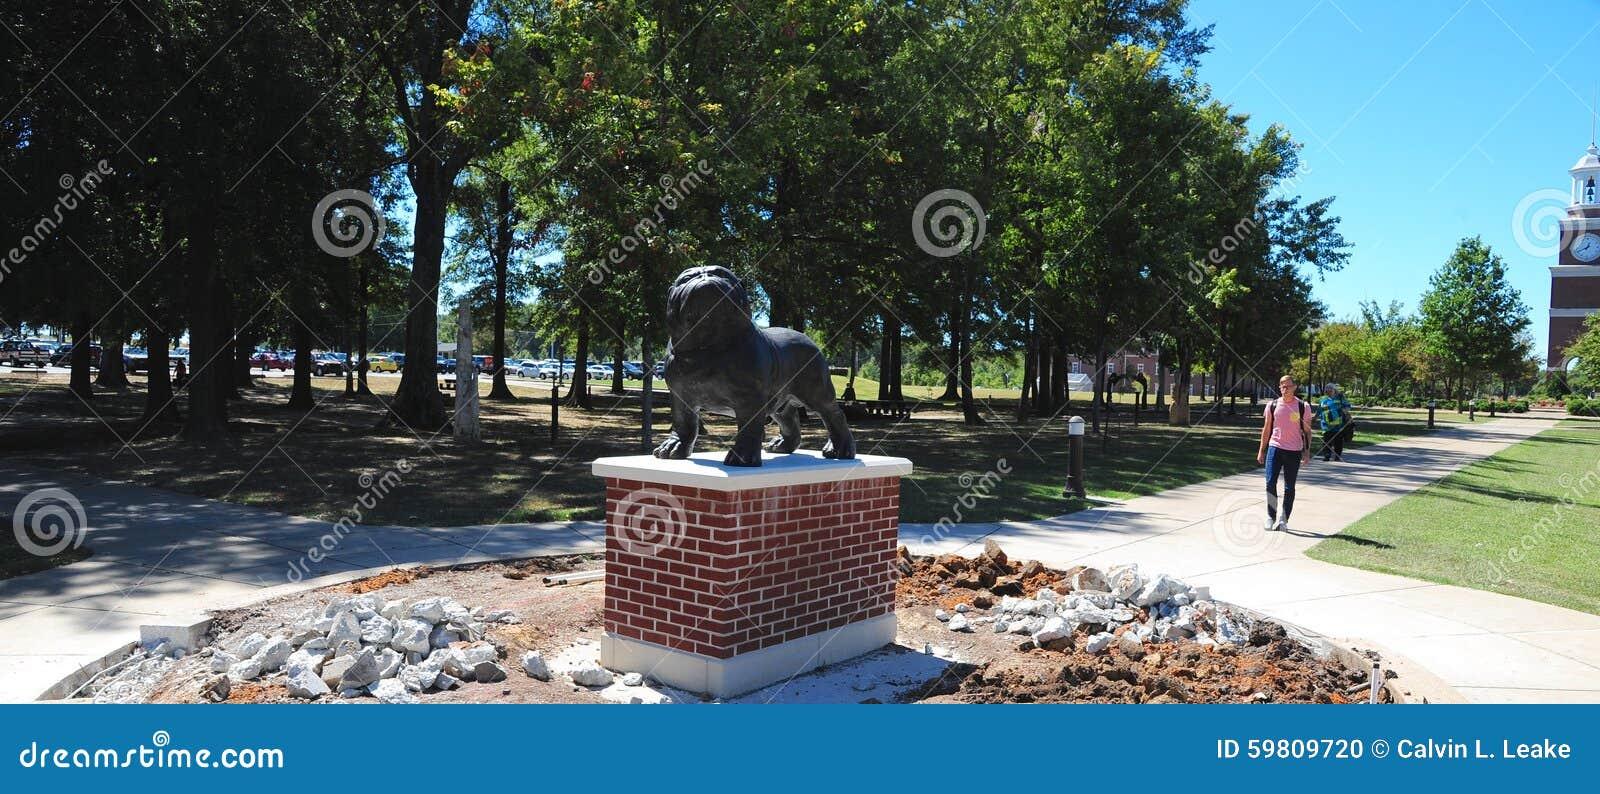 Bulldog Mascot Statue at Union University in Jackson, Tennessee.